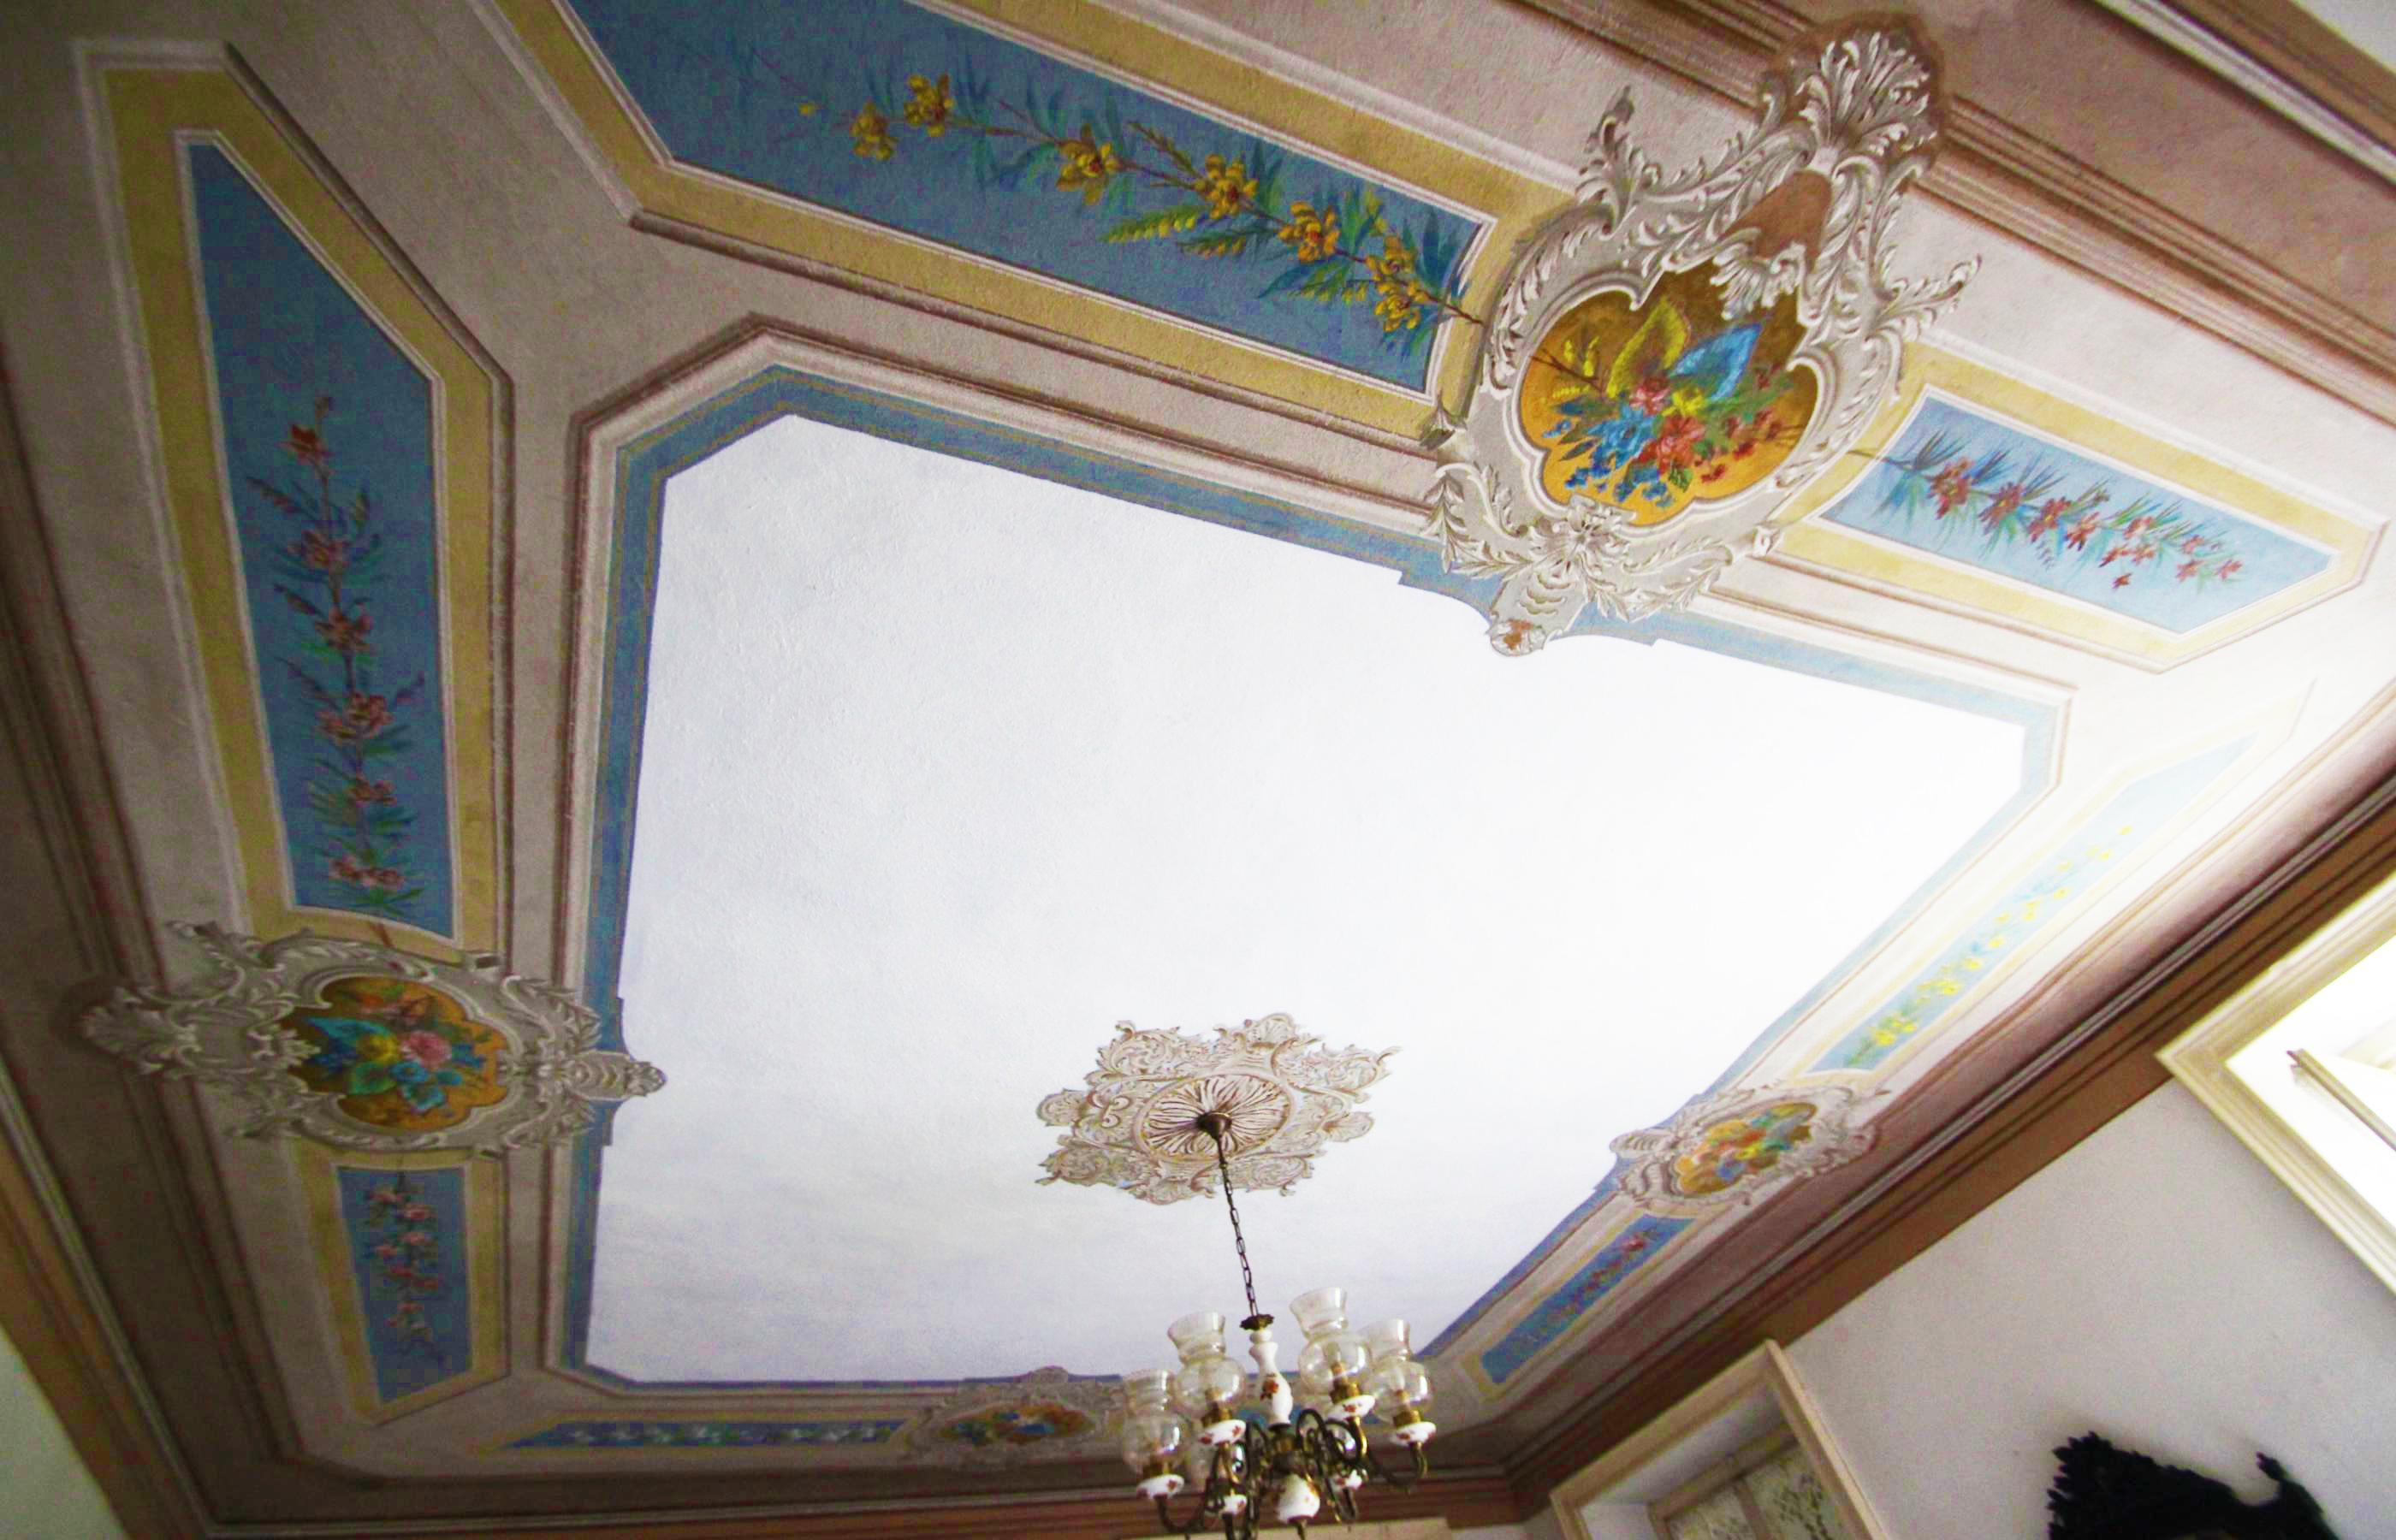 GOZZANO Villa d'epoca indipendente con giardino